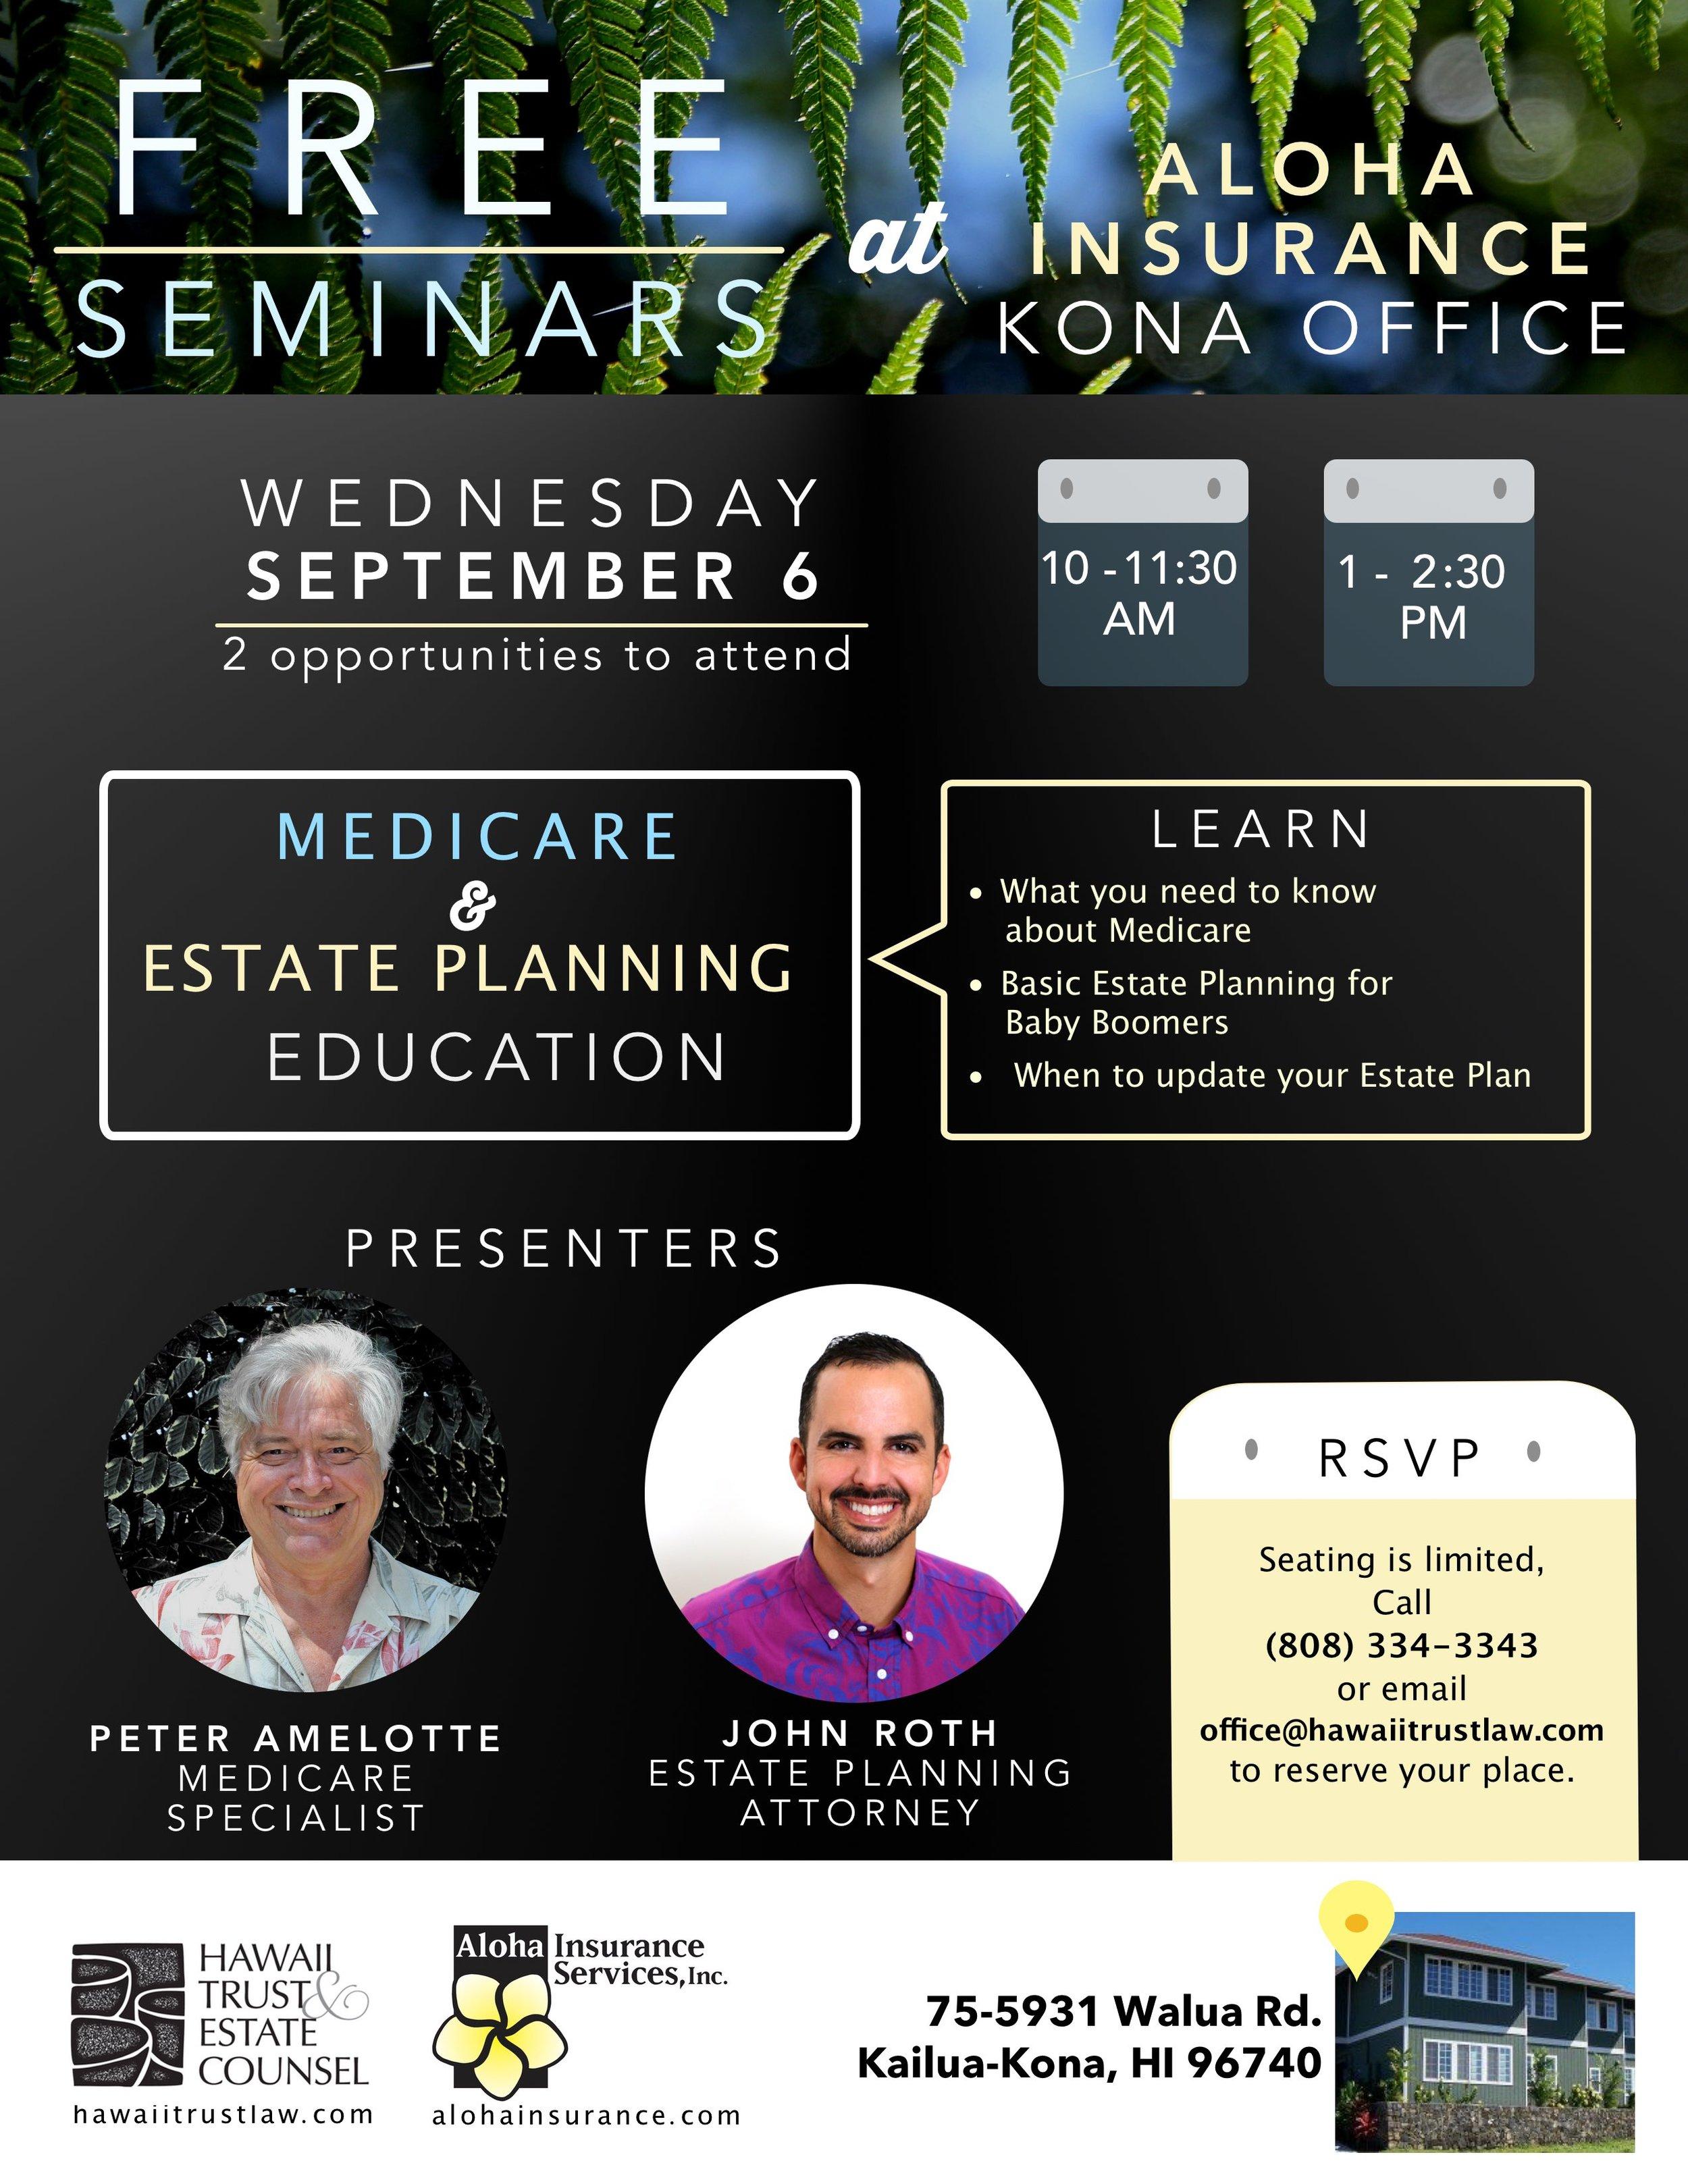 Medicare Estate Planning Seminar Kona